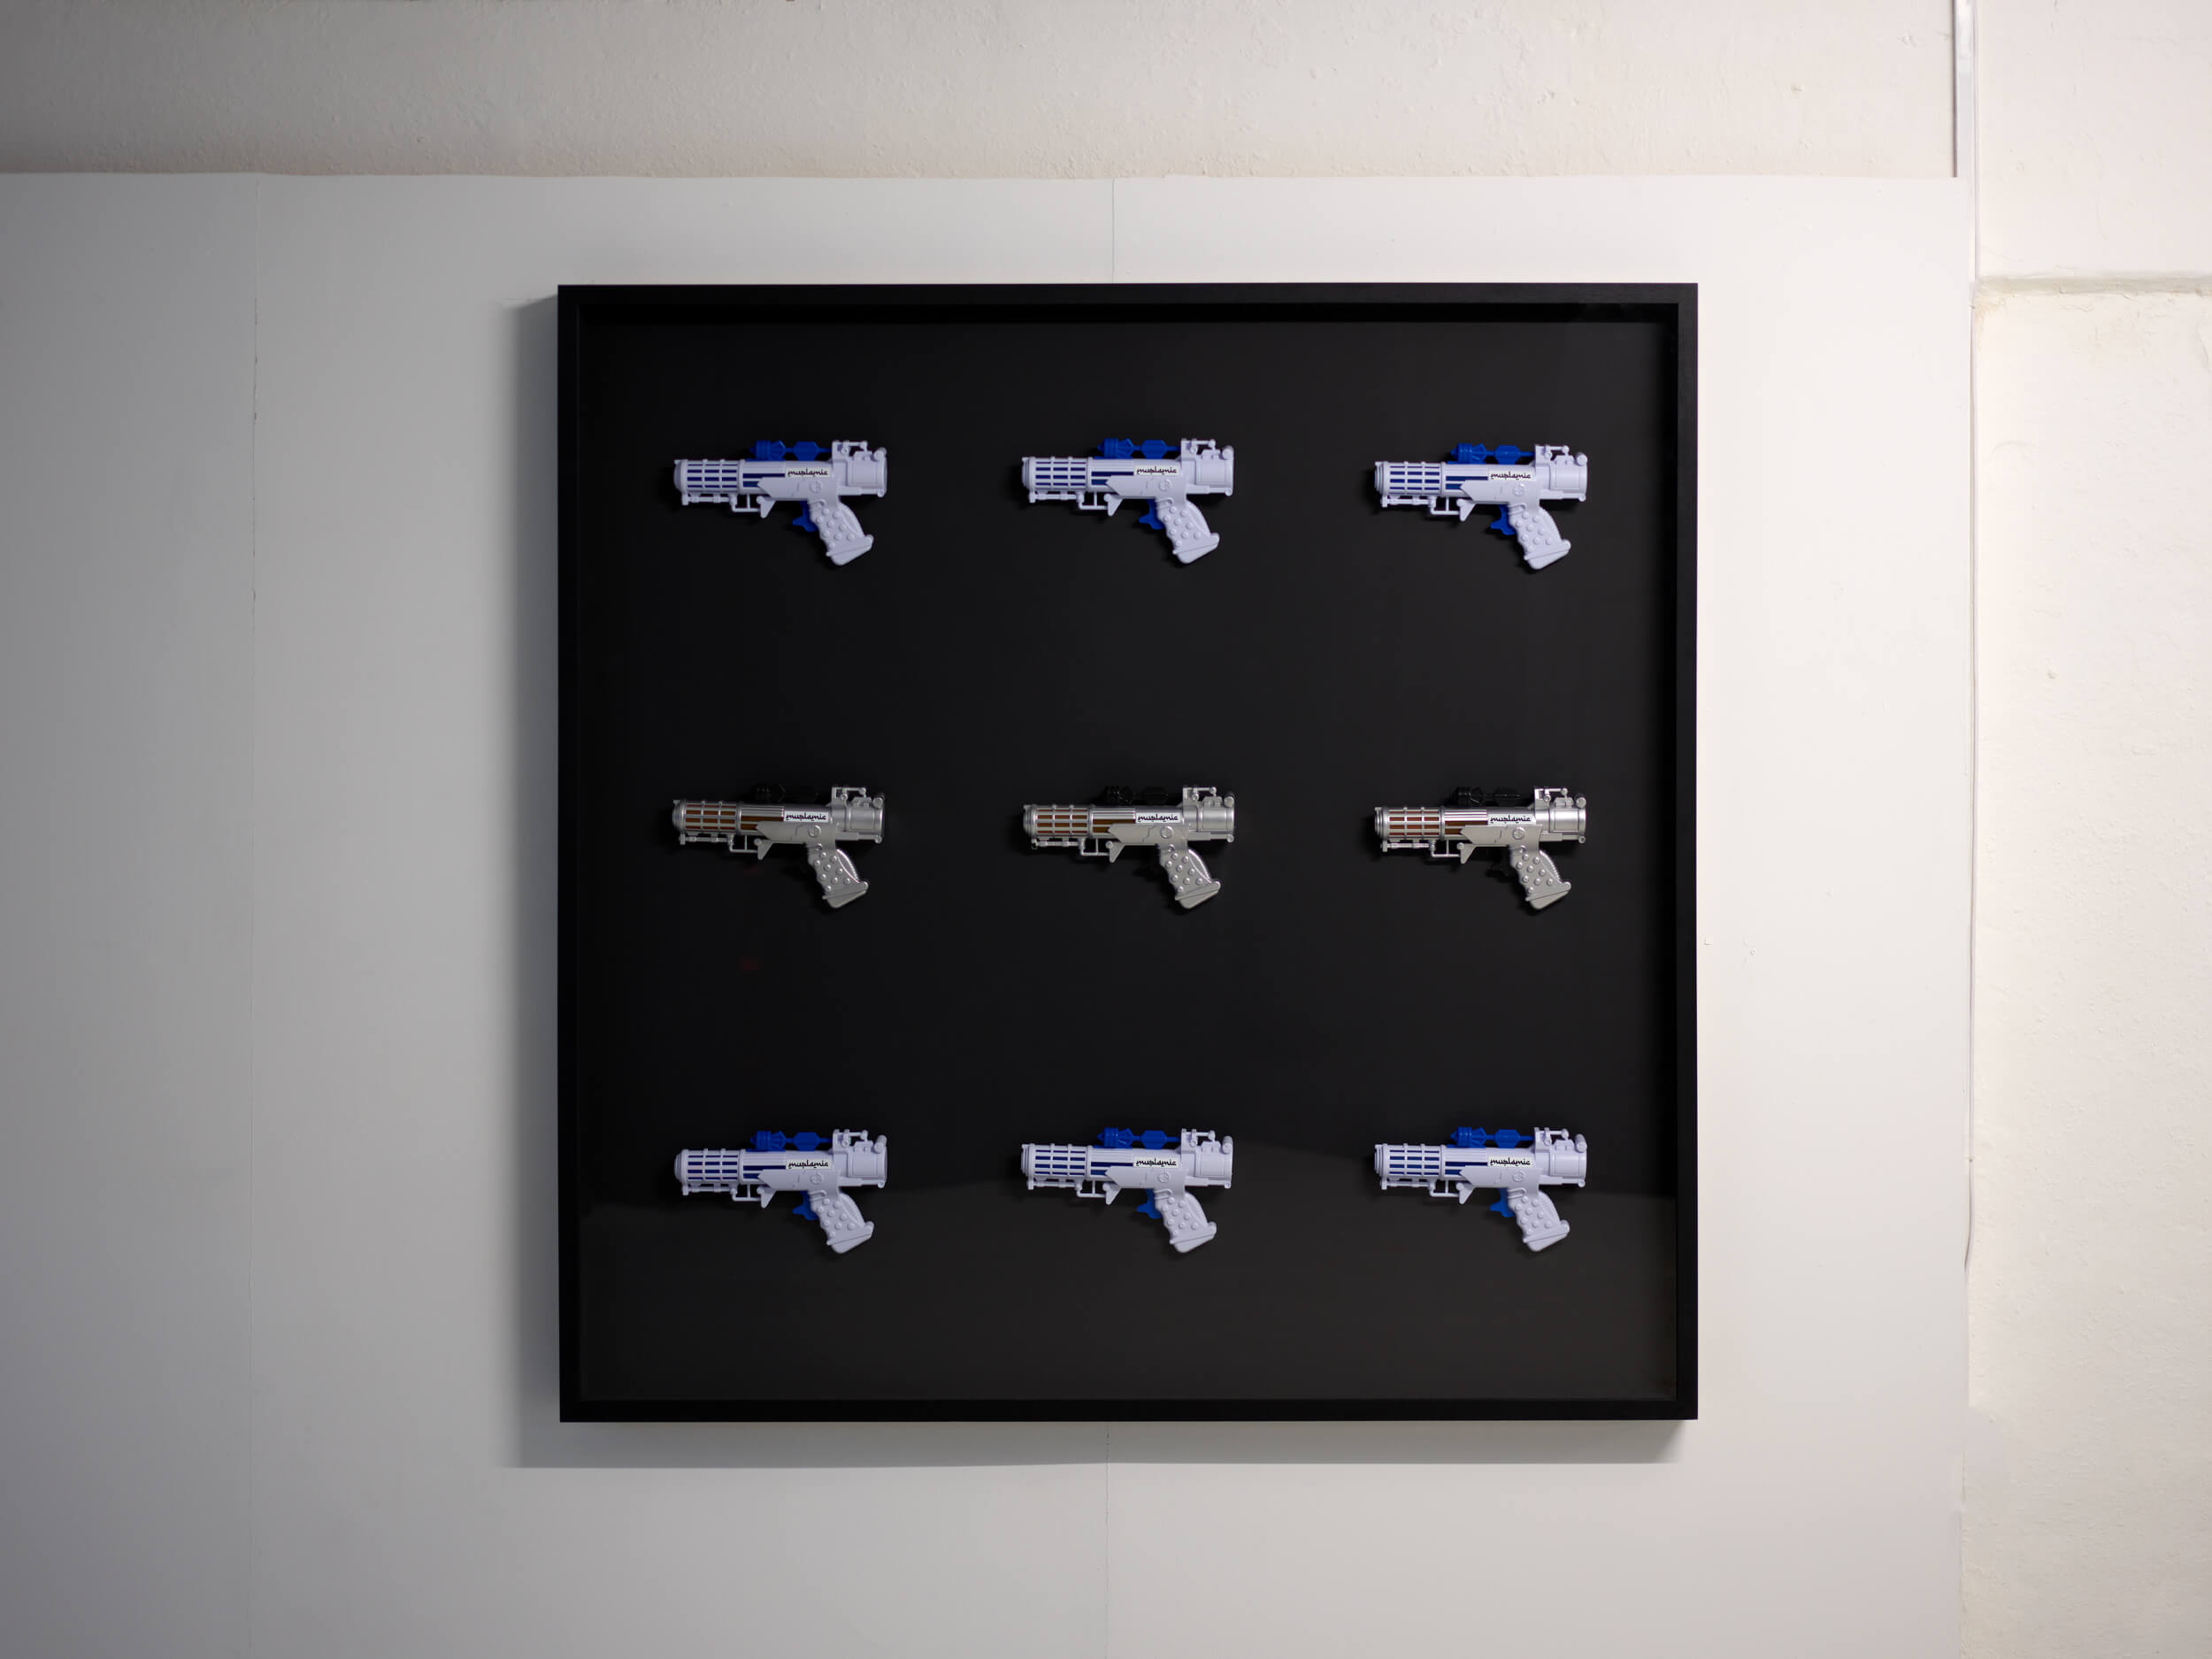 Muslamic Rayguns display